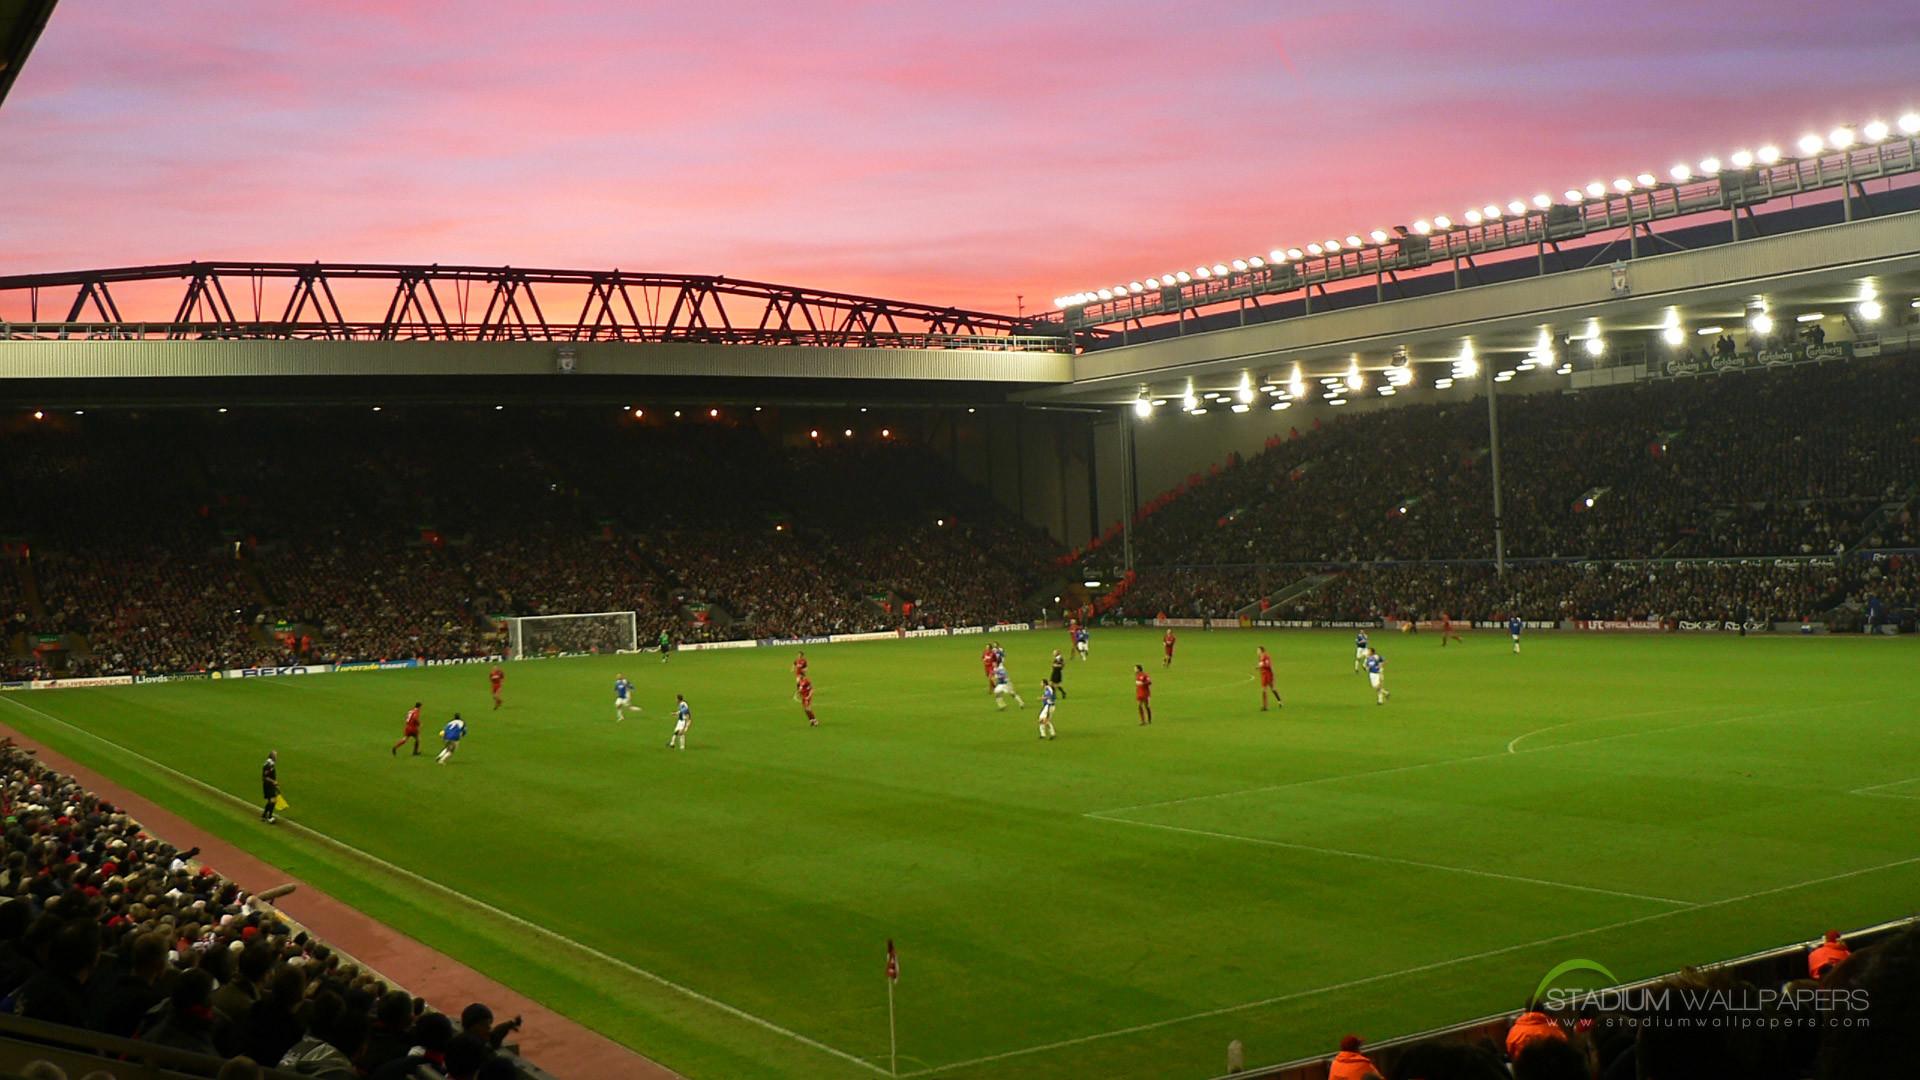 Wallpapersxl Stadium Liverpool Anfield 469797 1920×1080